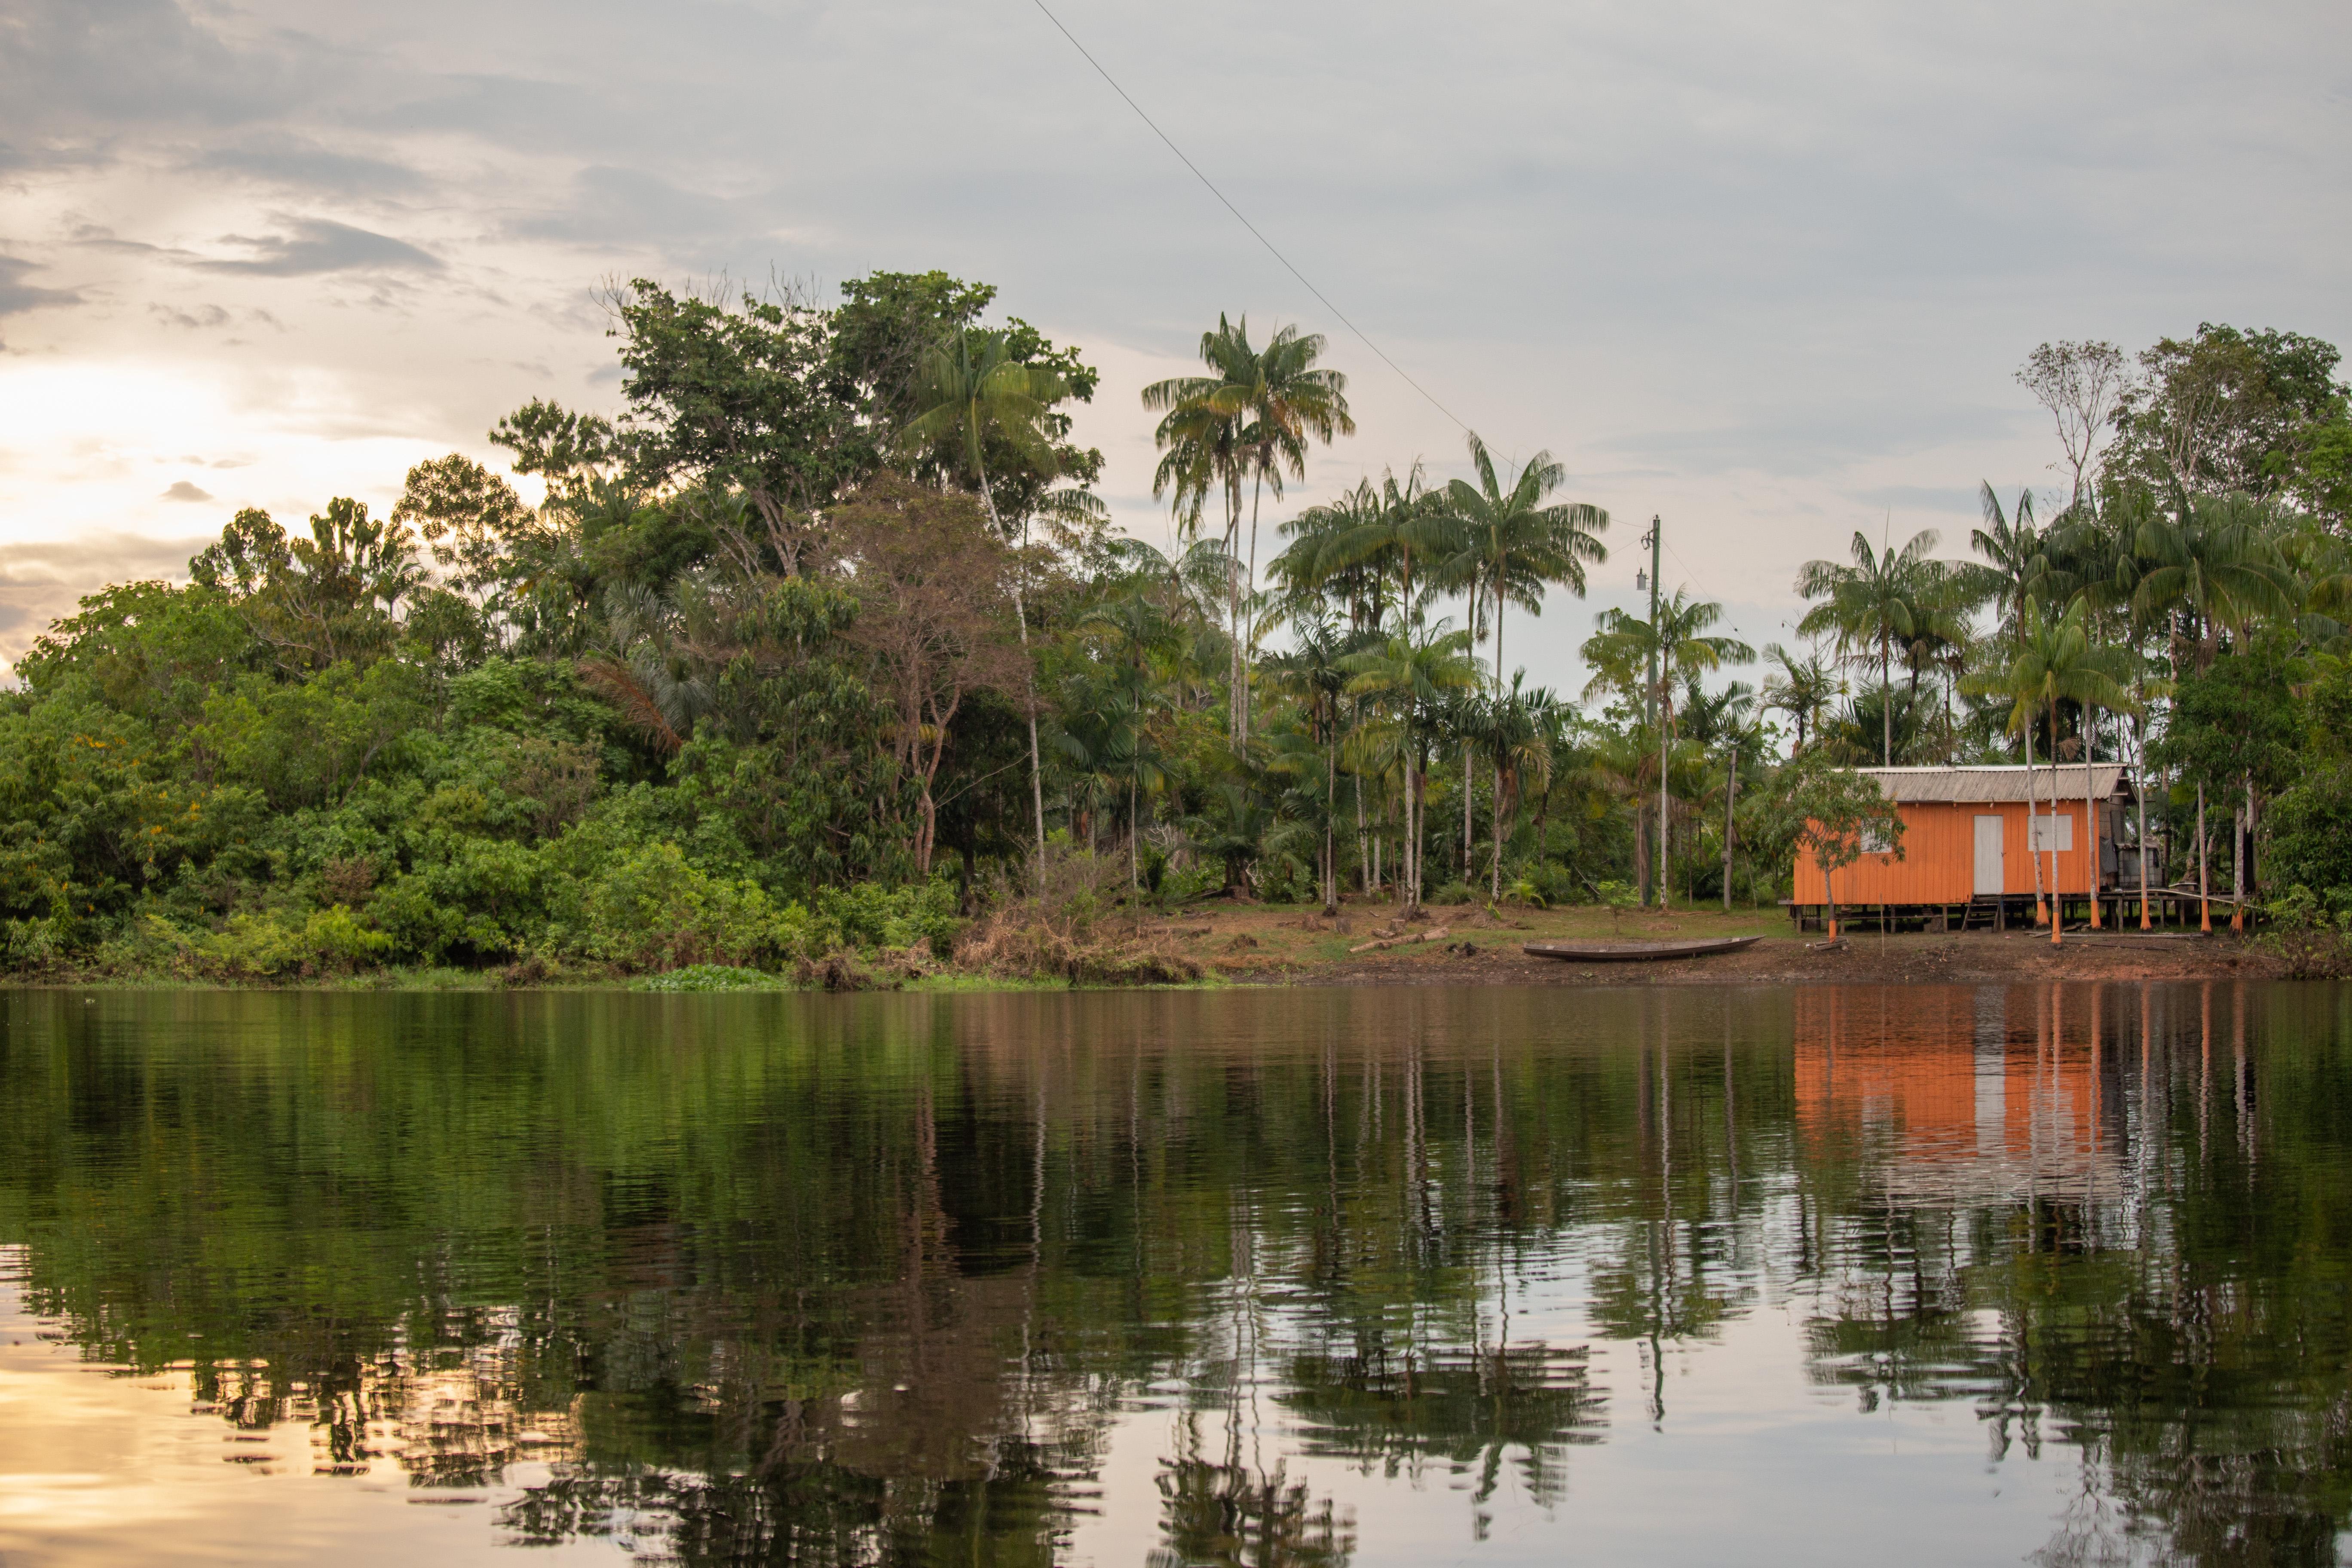 Brésil/Manaus